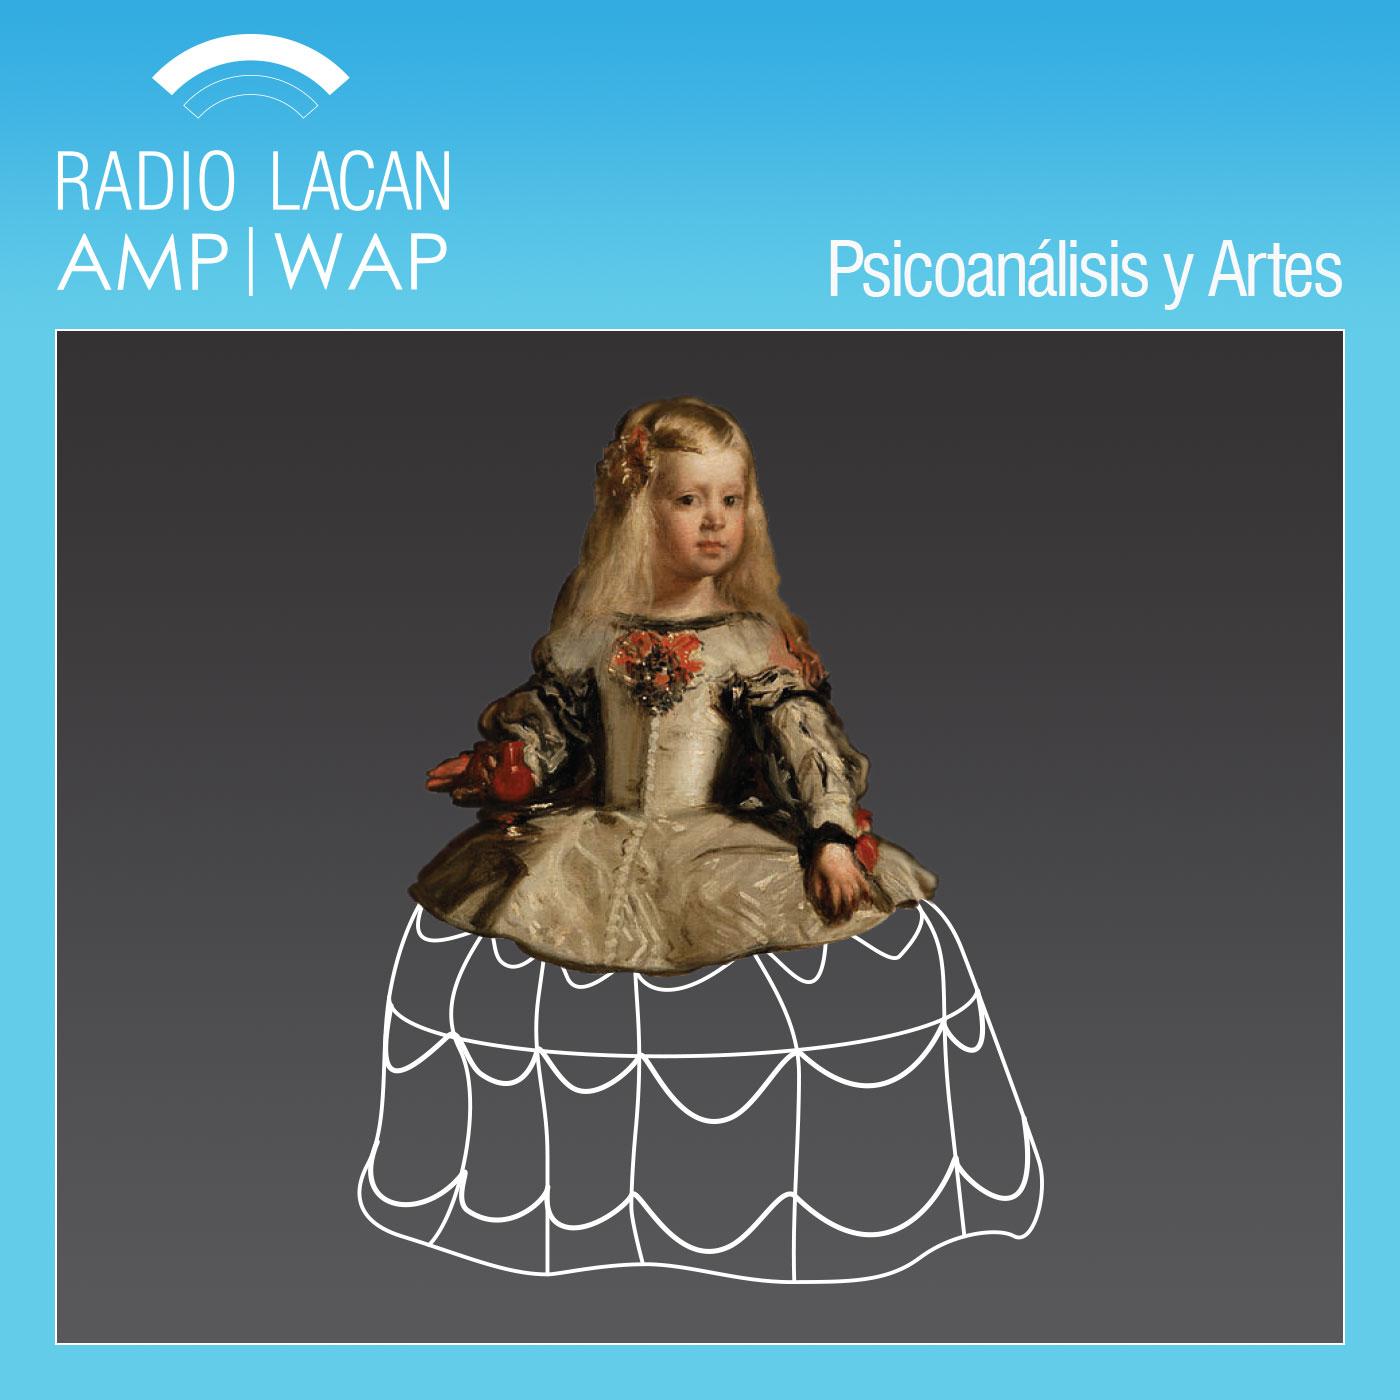 RadioLacan.com |